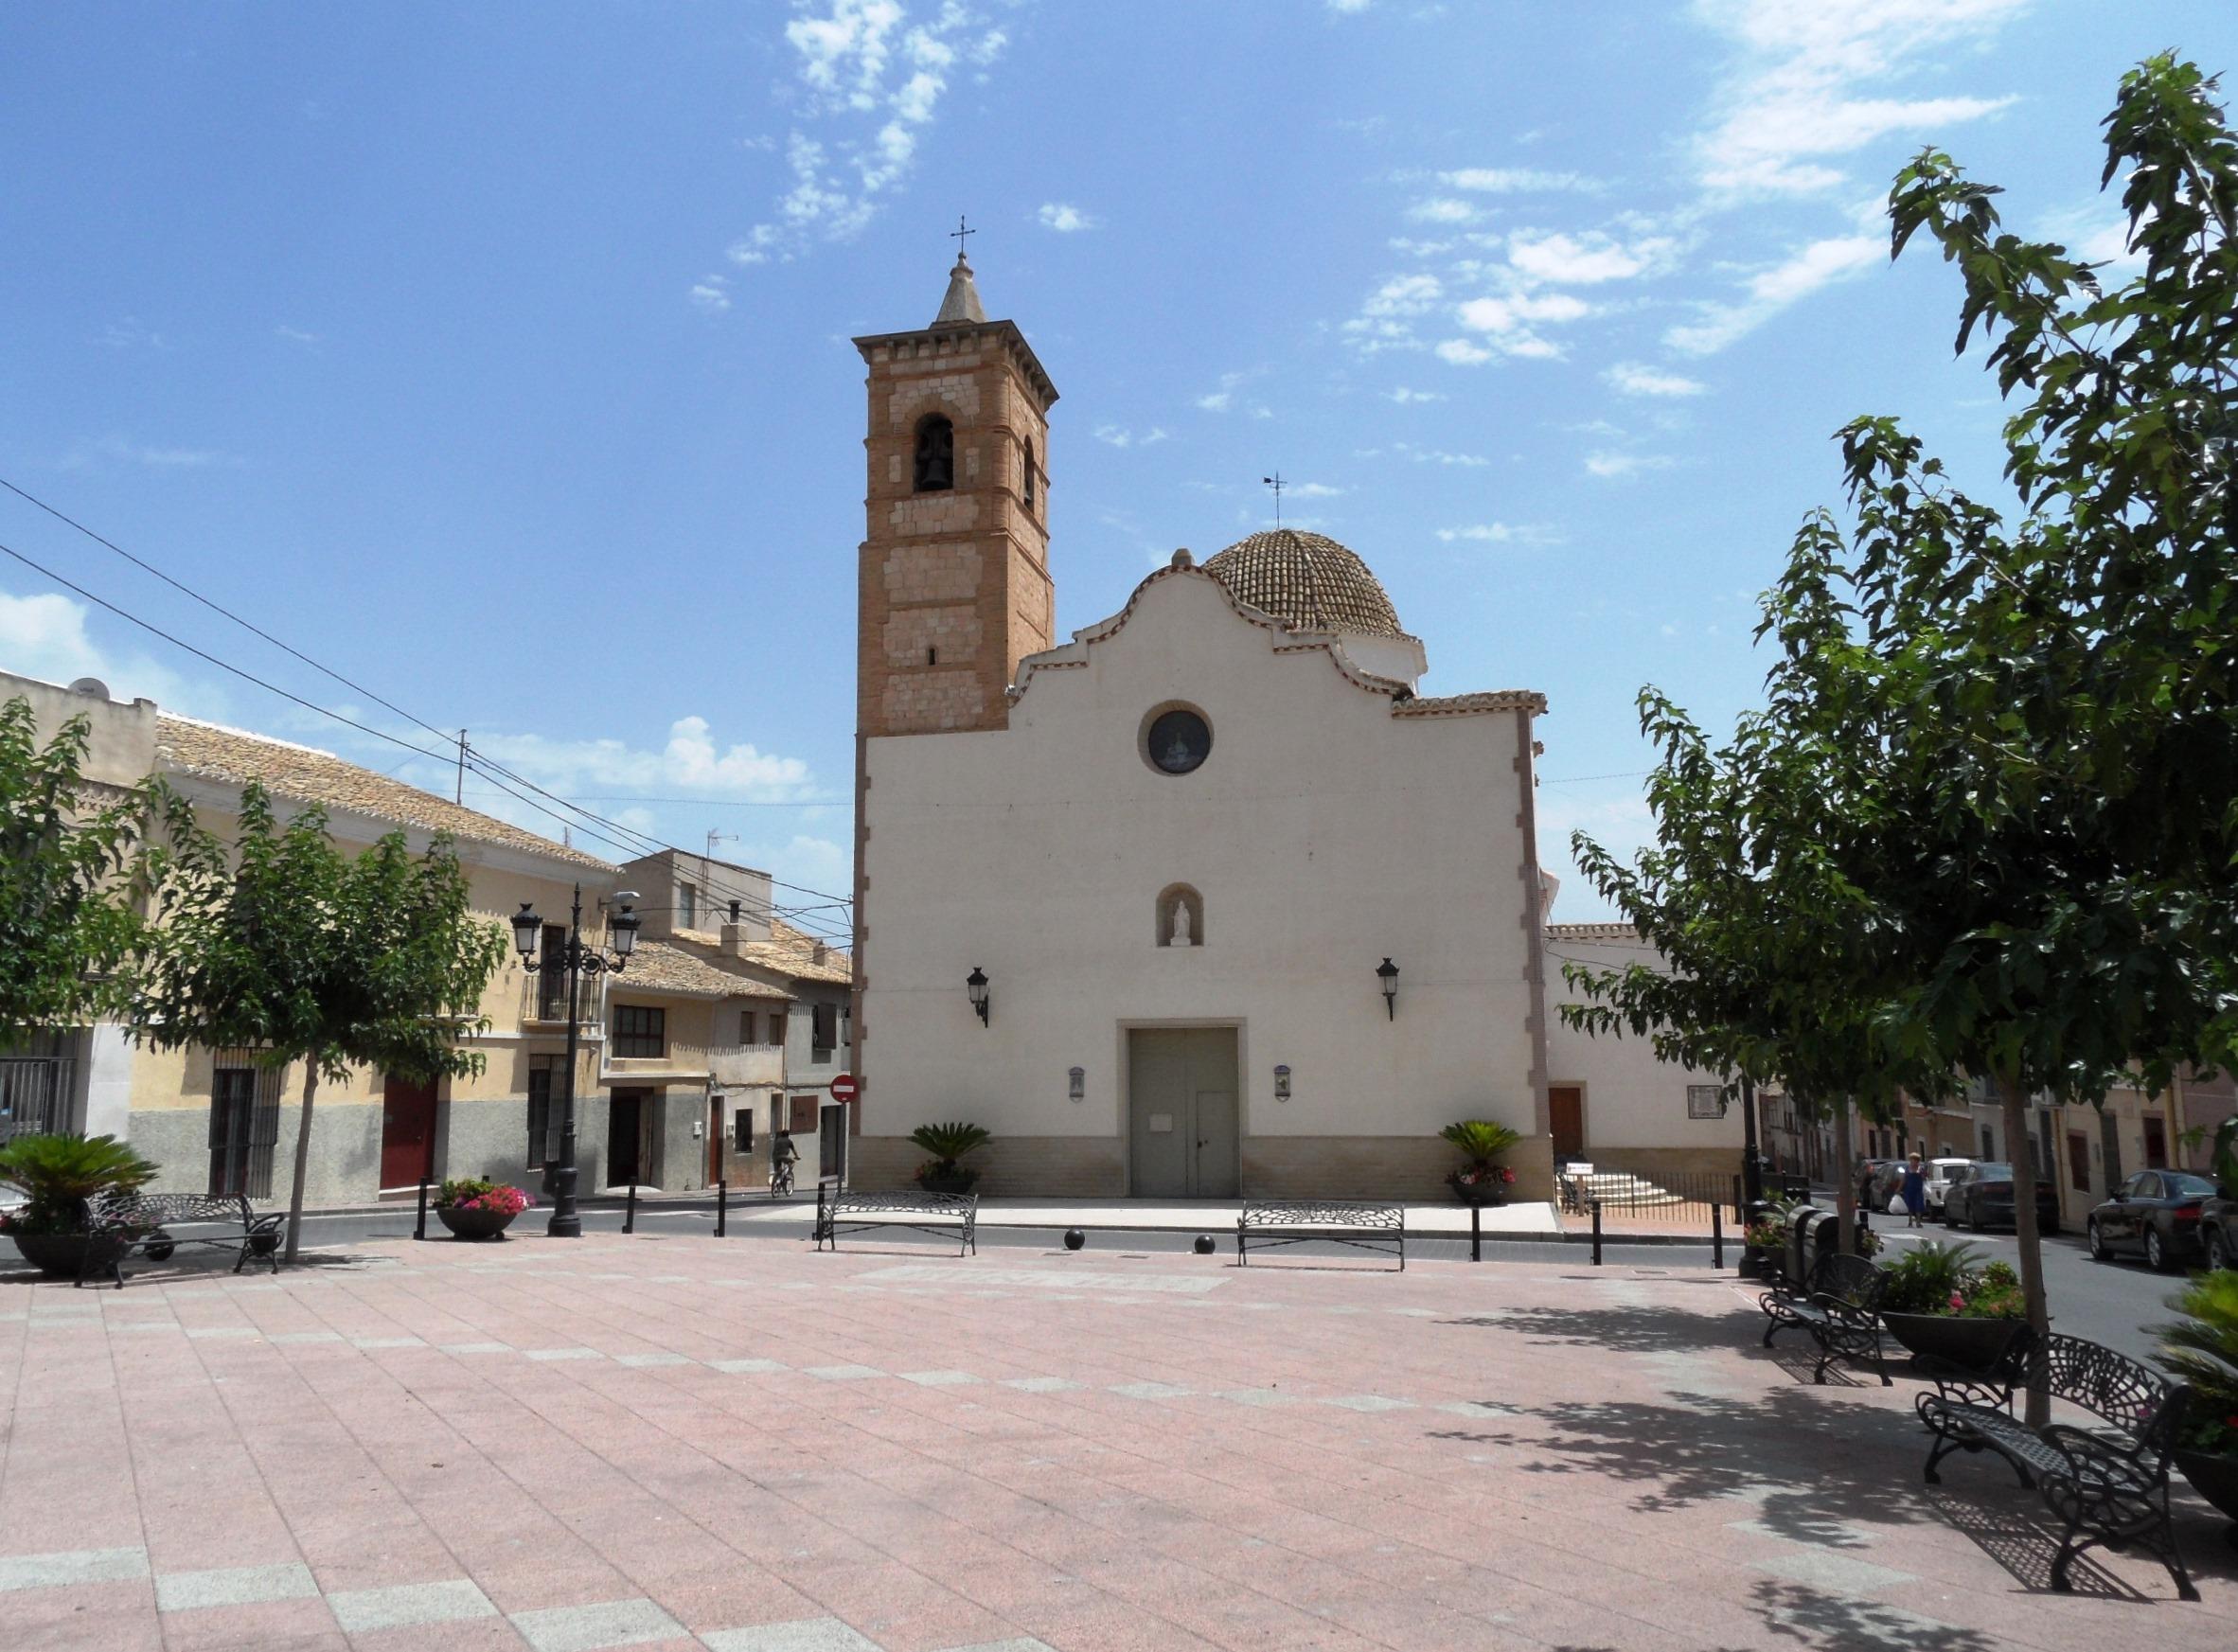 iglesia y espana: